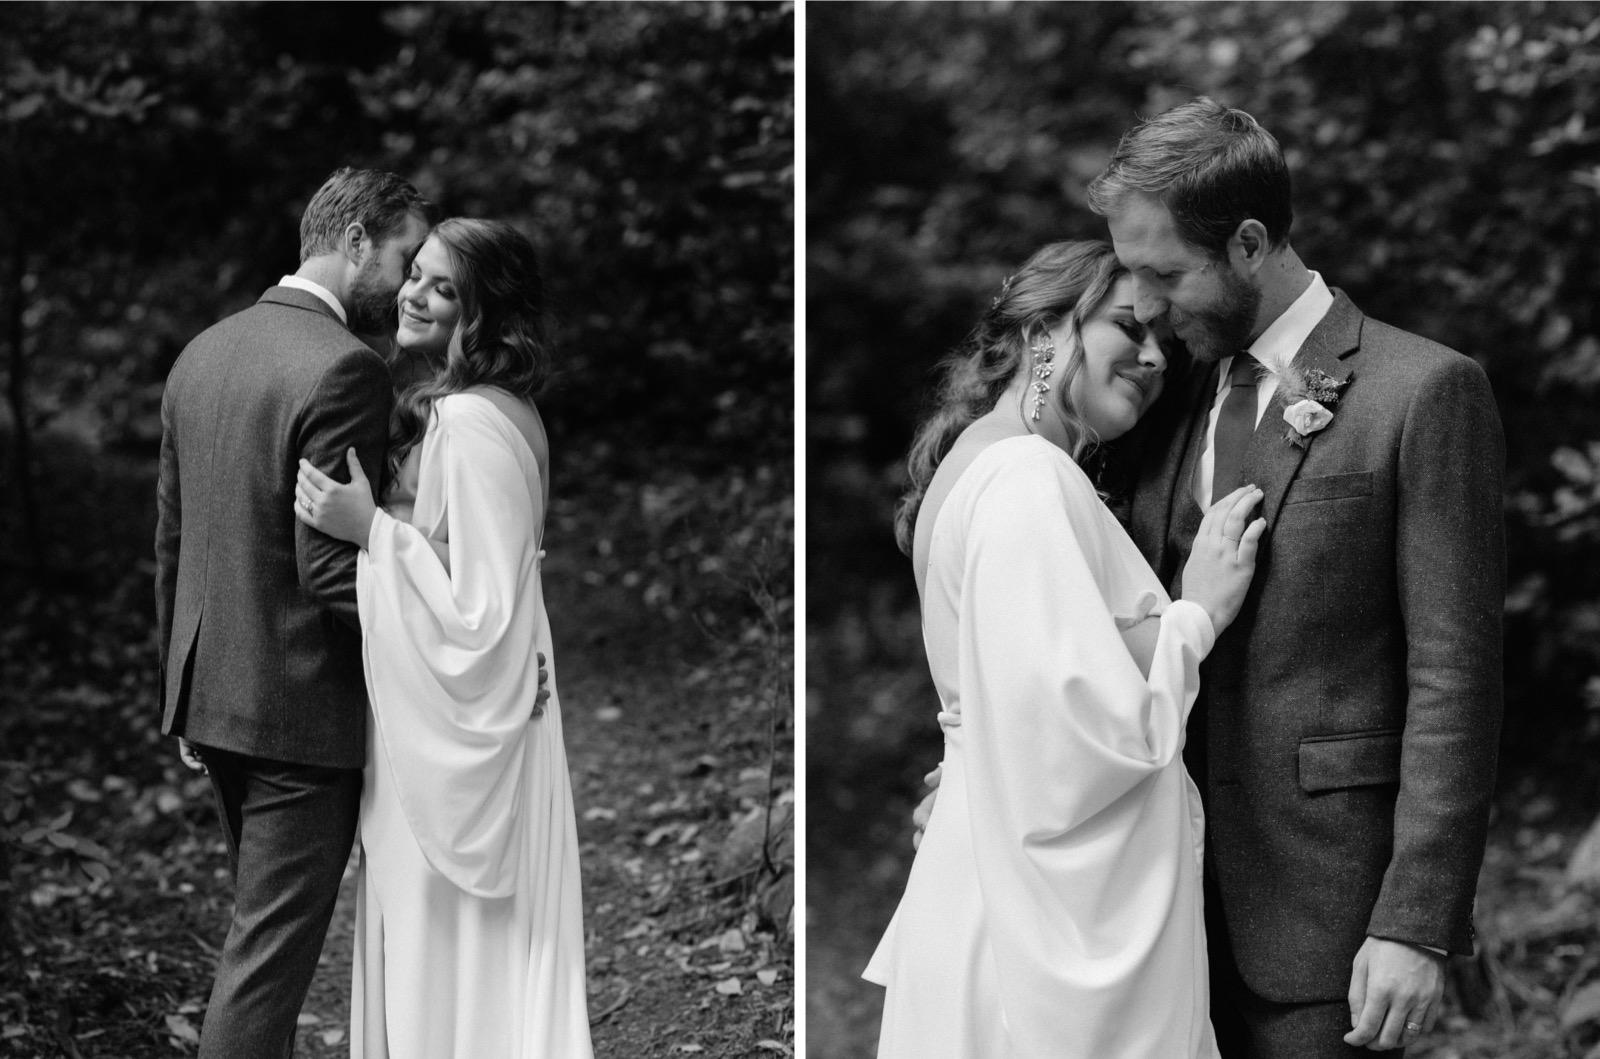 094_Emily & Jeff Wedding 0851_Emily & Jeff Wedding 0846_the-waterfall-lodge_forest_wedding_ben-lomond_intimate